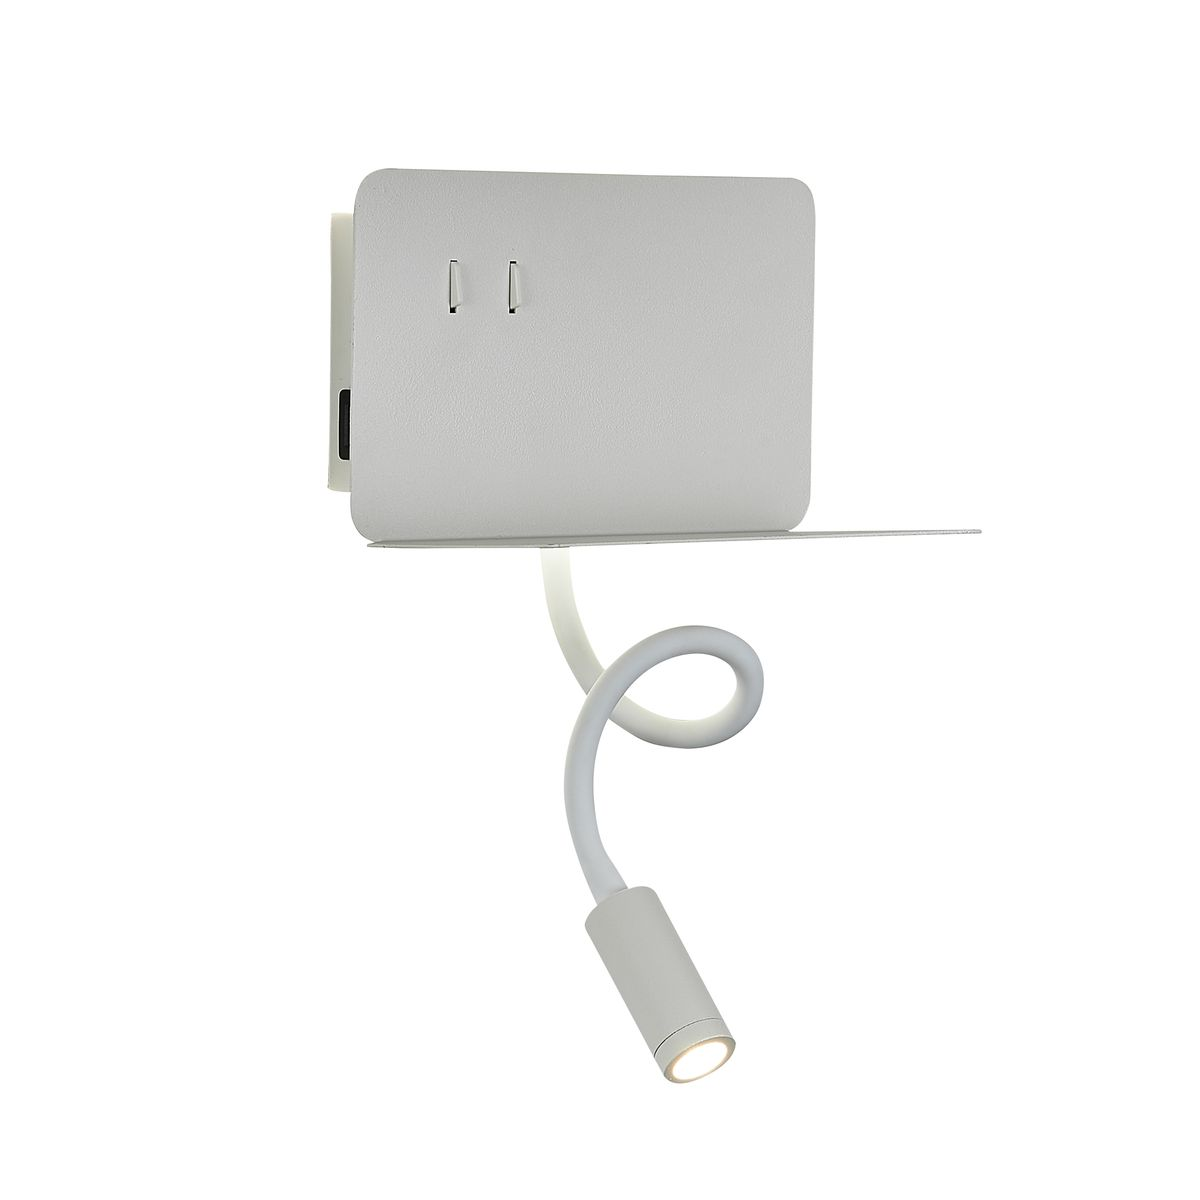 Светильник ST Luce SL1576.501.02 Pinaggio (USB зарядное устройство) зарядное устройство fusechicken gravity lift wgl